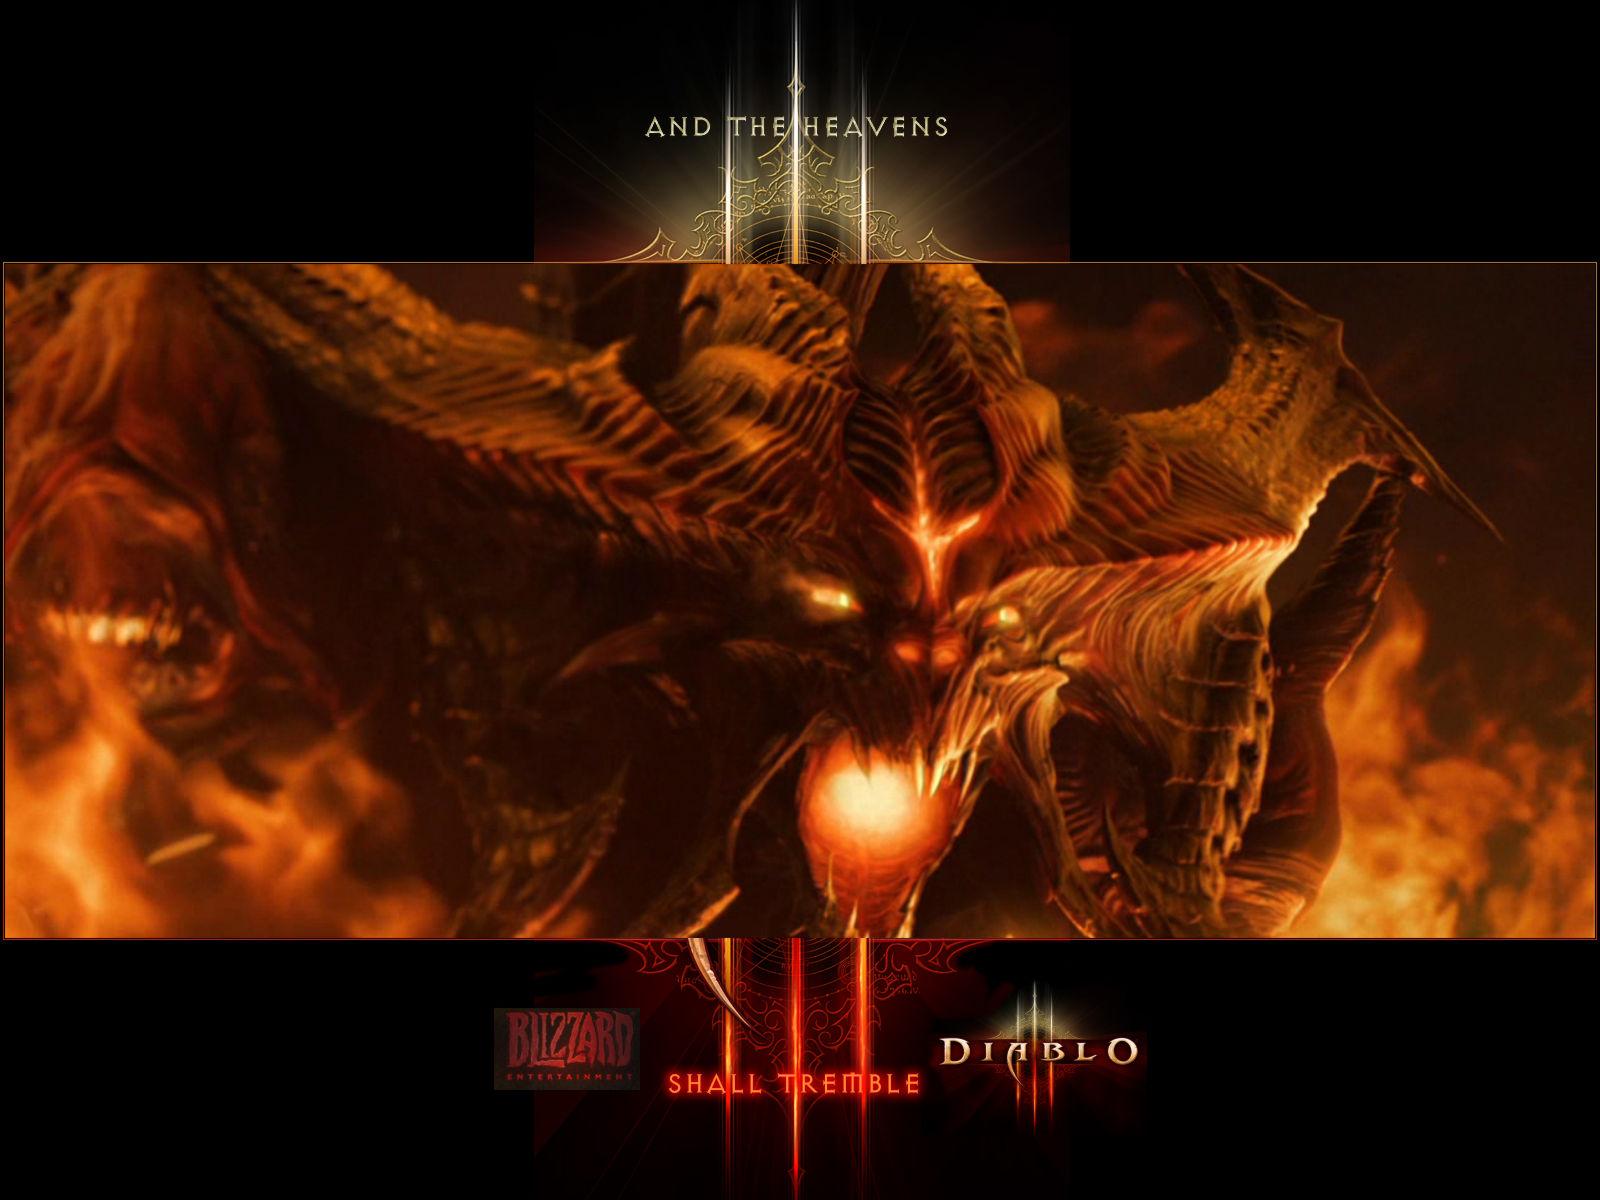 My Diablo 3 Desktop